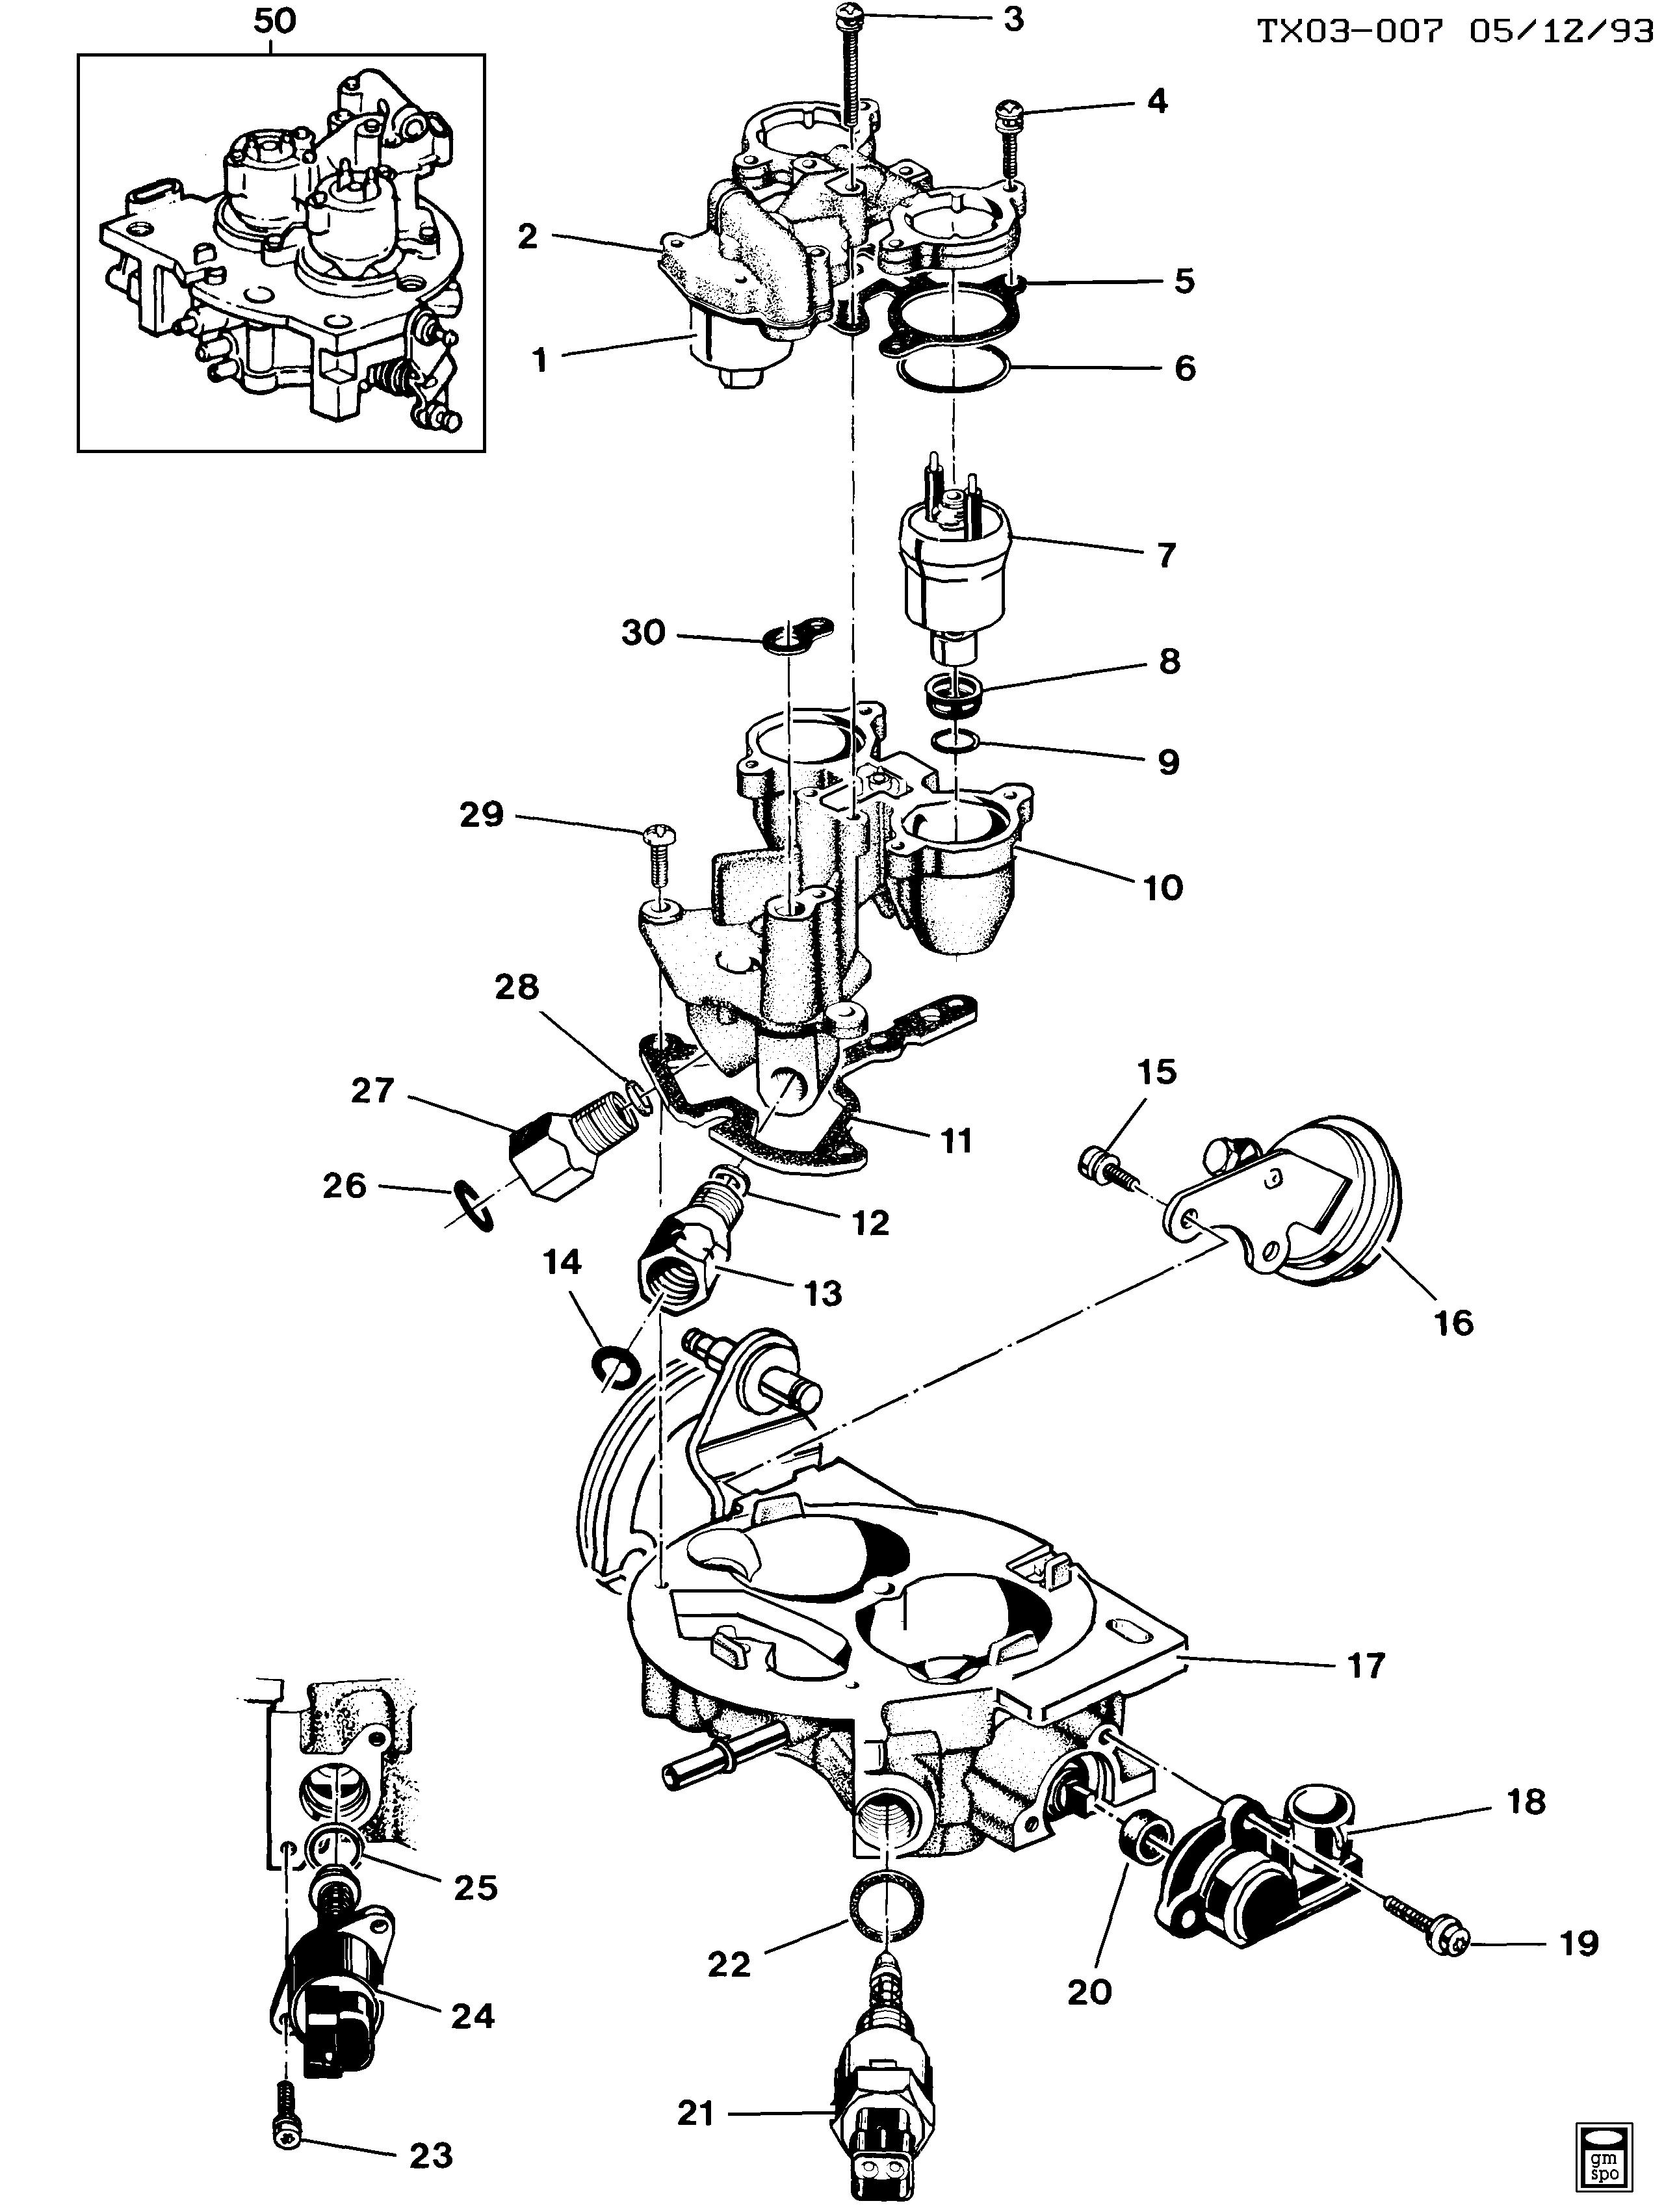 P30 VAN - Throttle body injection/dual injector > Chevrolet